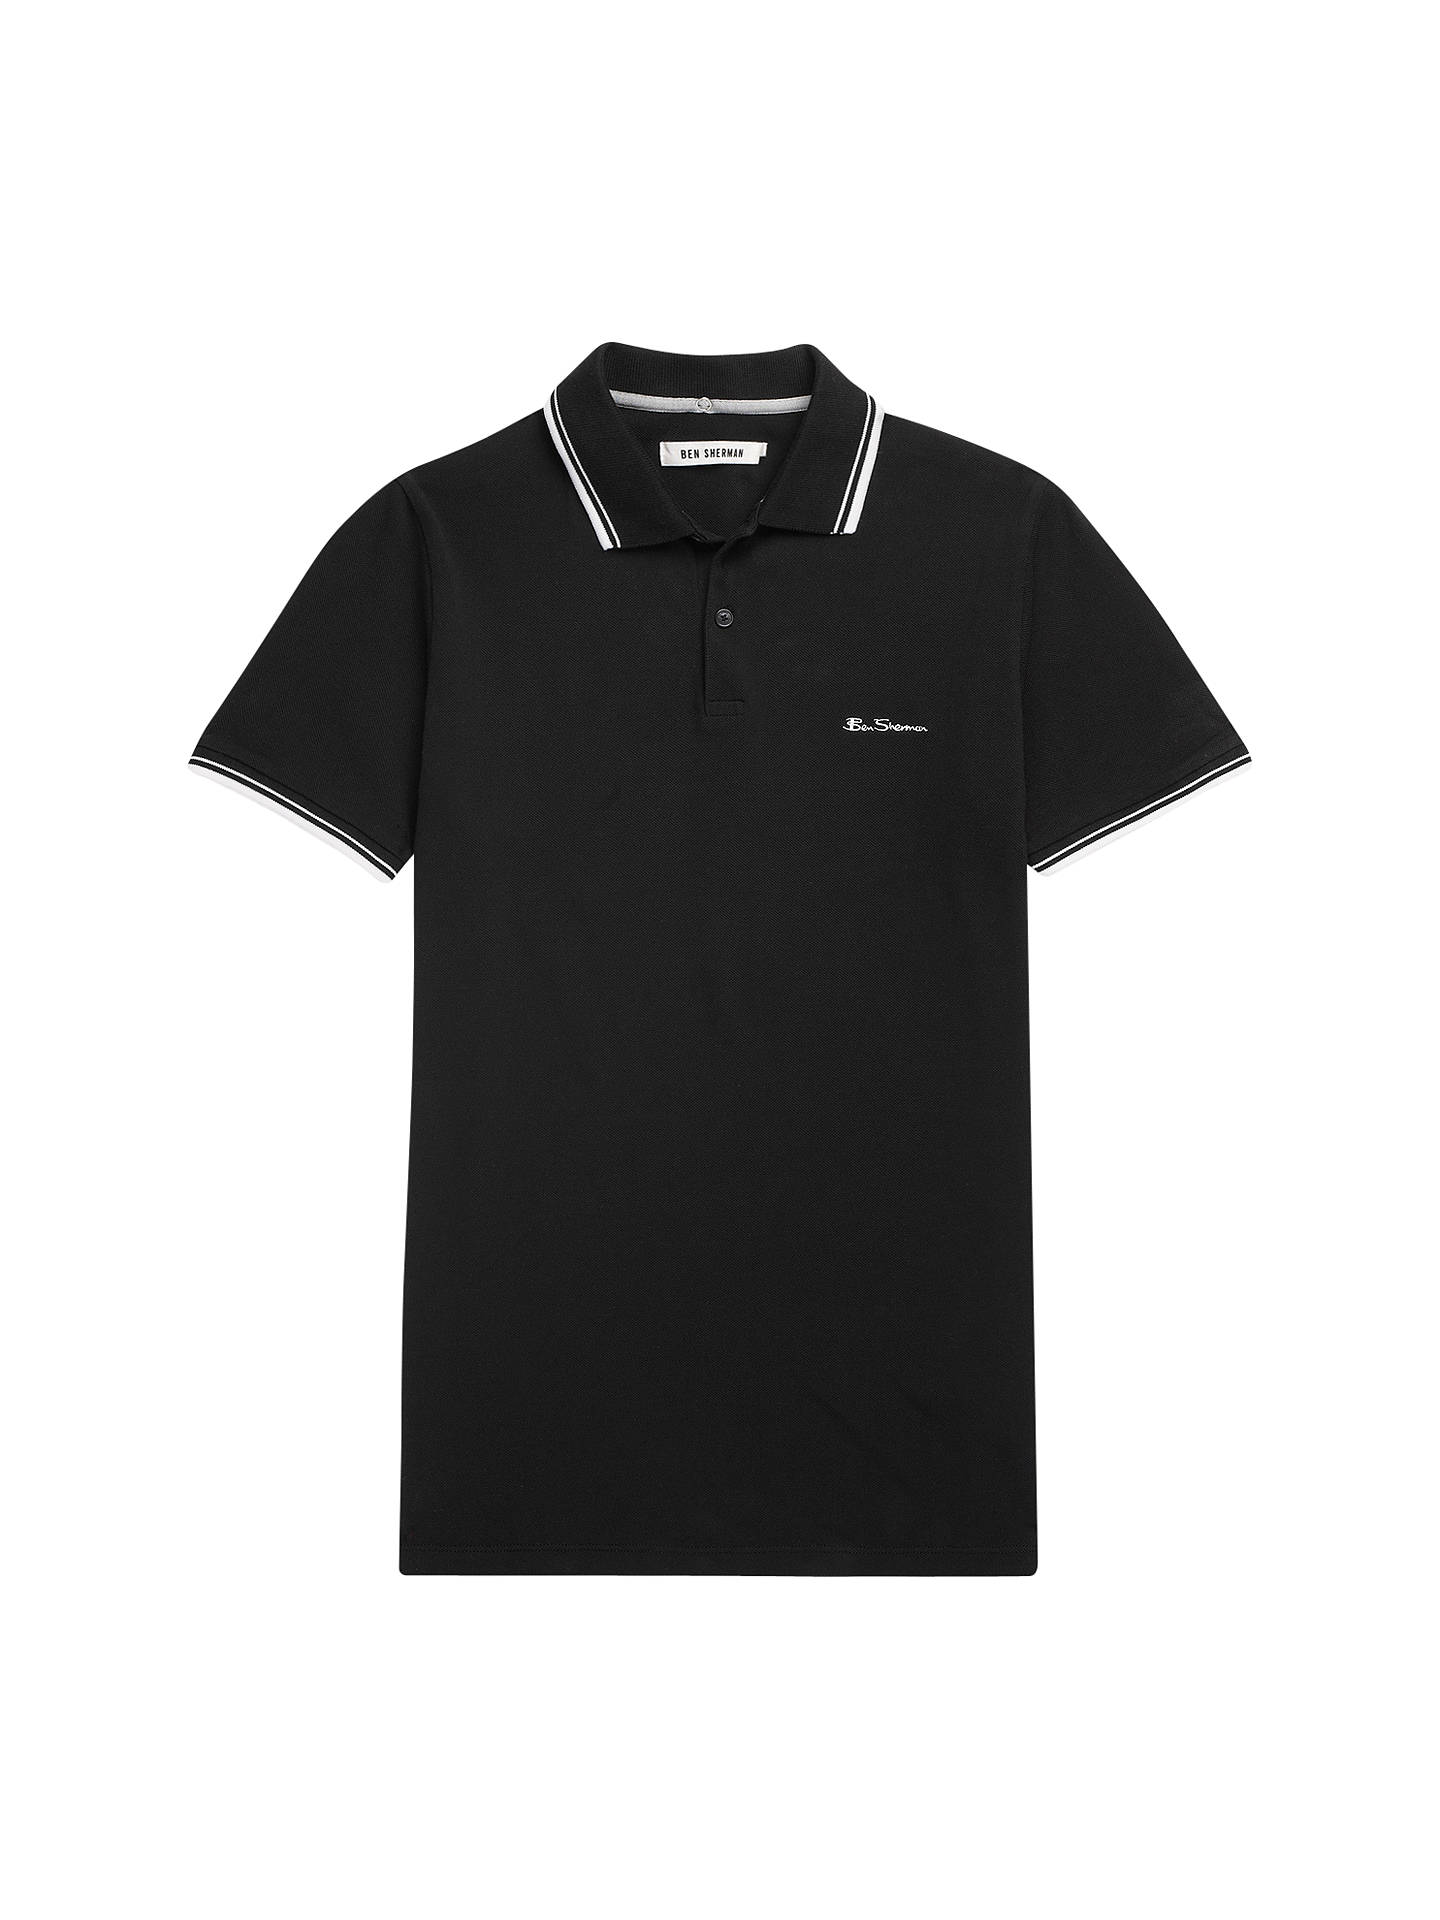 54743dfc Buy Ben Sherman Romford Polo Shirt, Jet Black, S Online at johnlewis.com ...